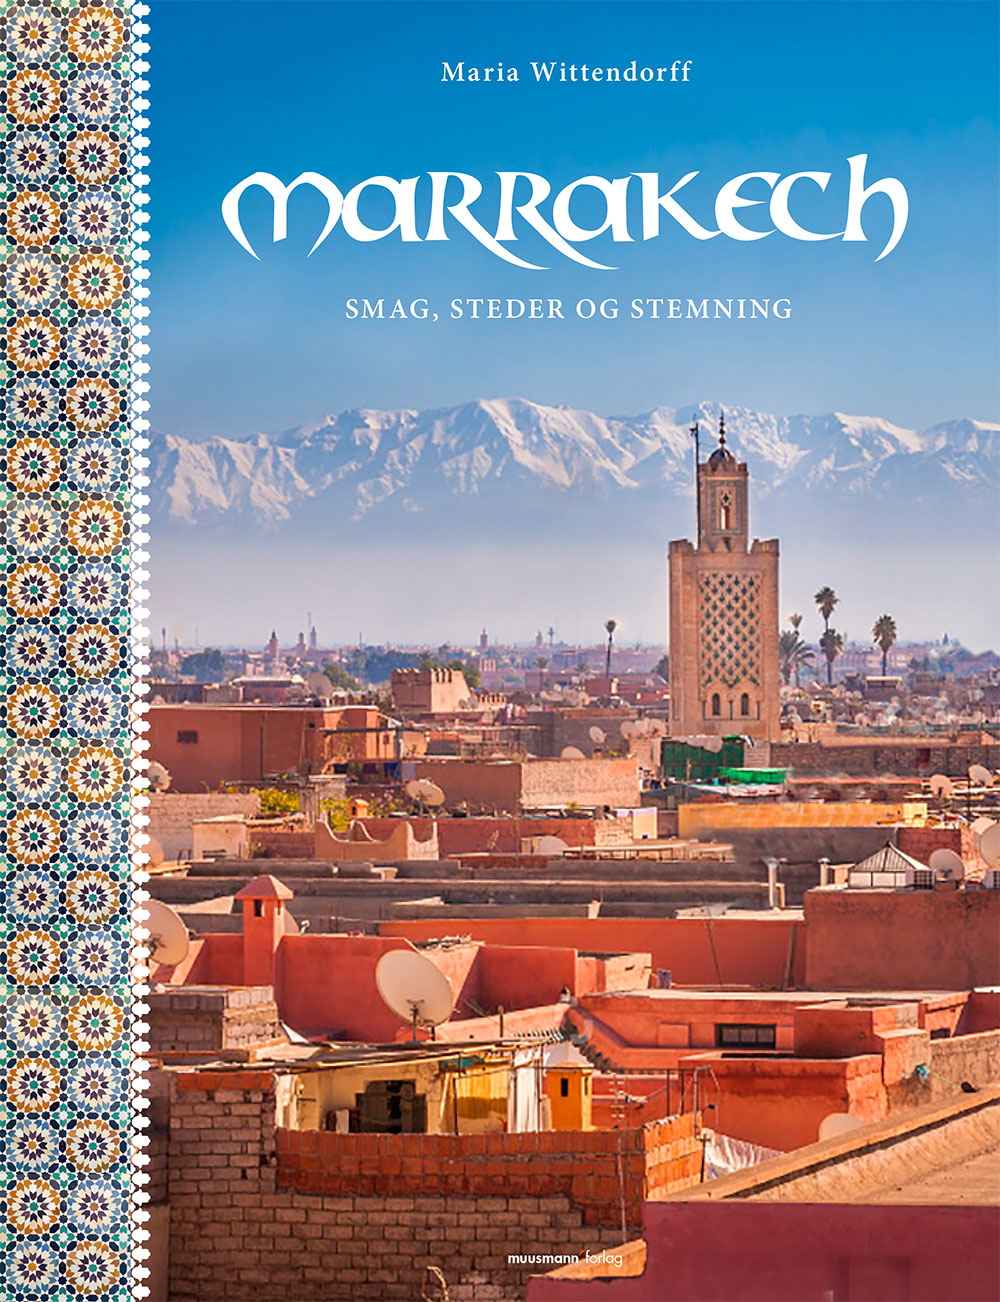 Smag på Marrakech